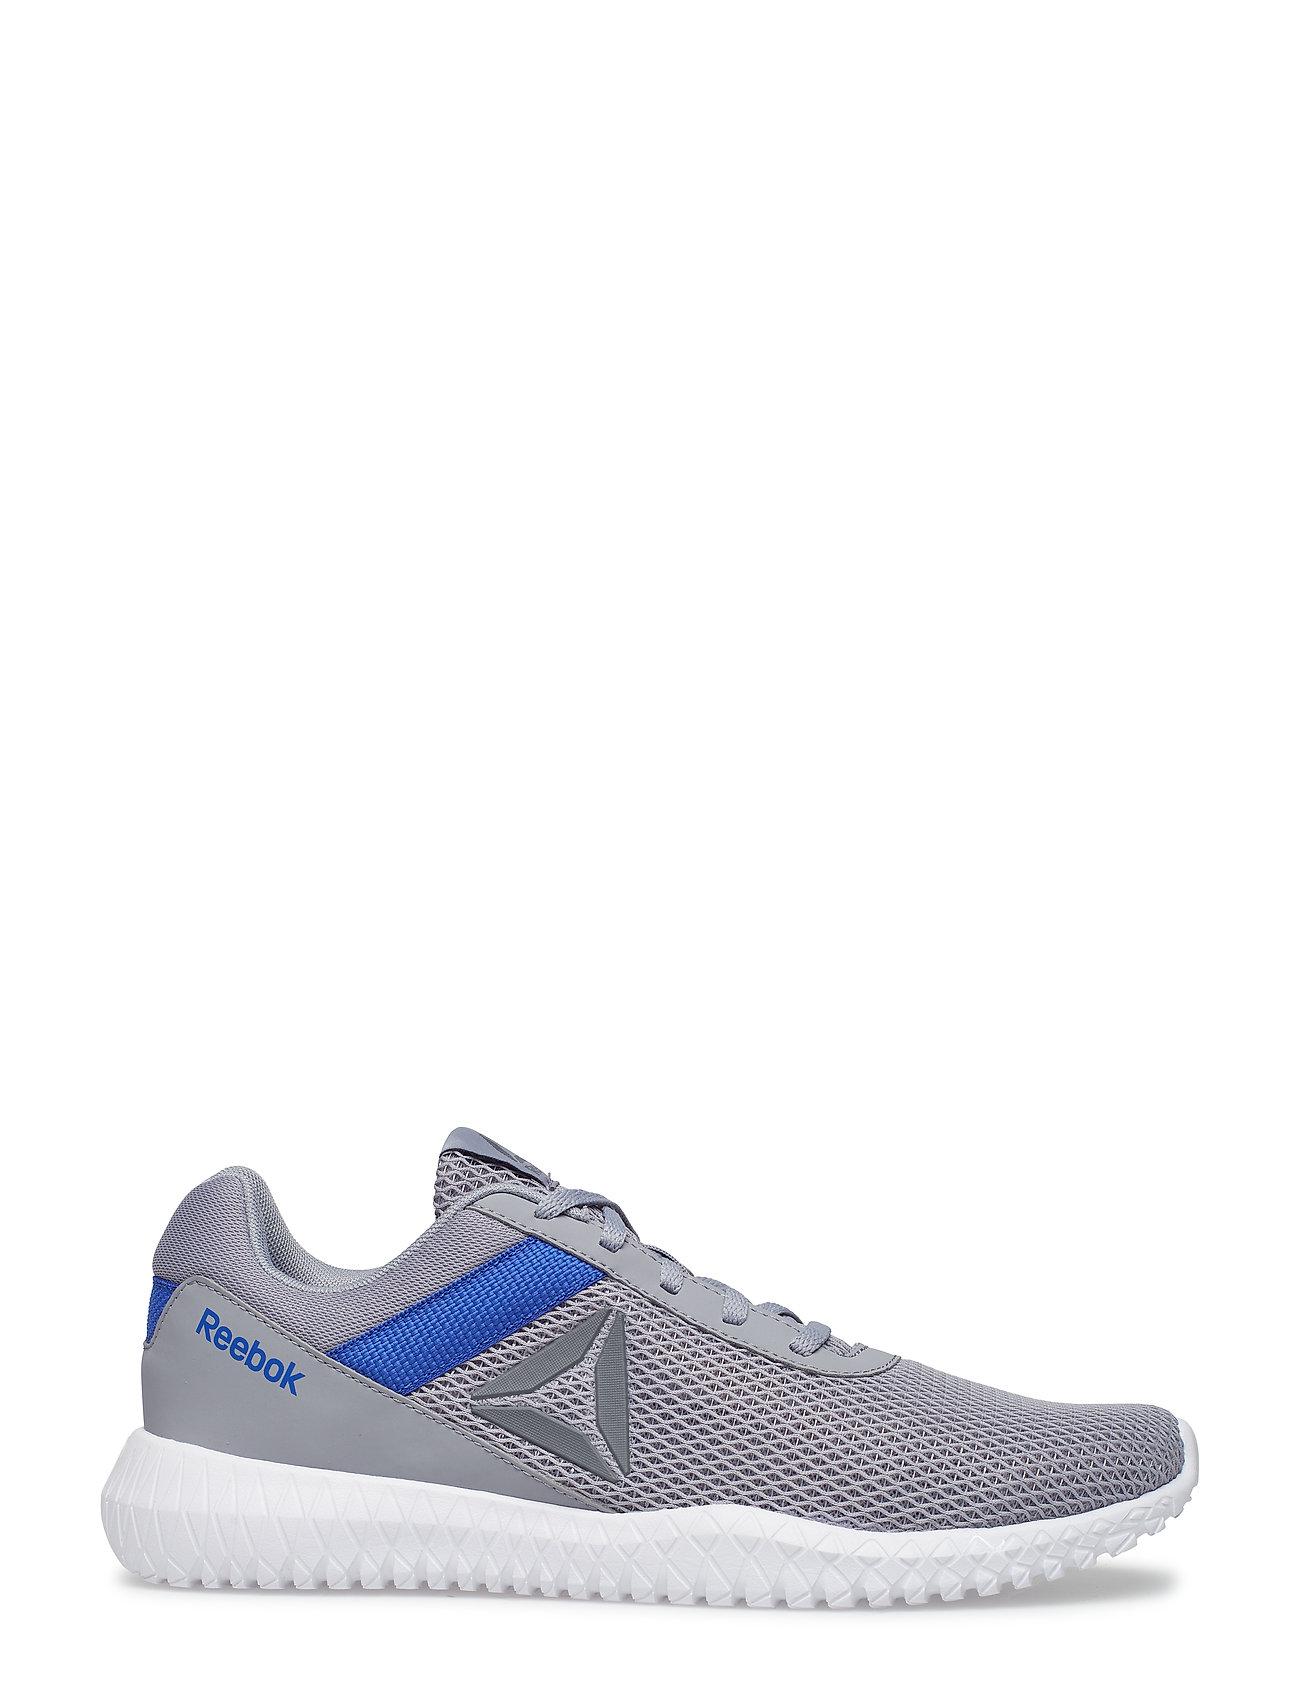 bd4f1cf8c45 Reebok sneakers – Reebok Flexagon Energy Tr til herre i SHADOW/GREY ...